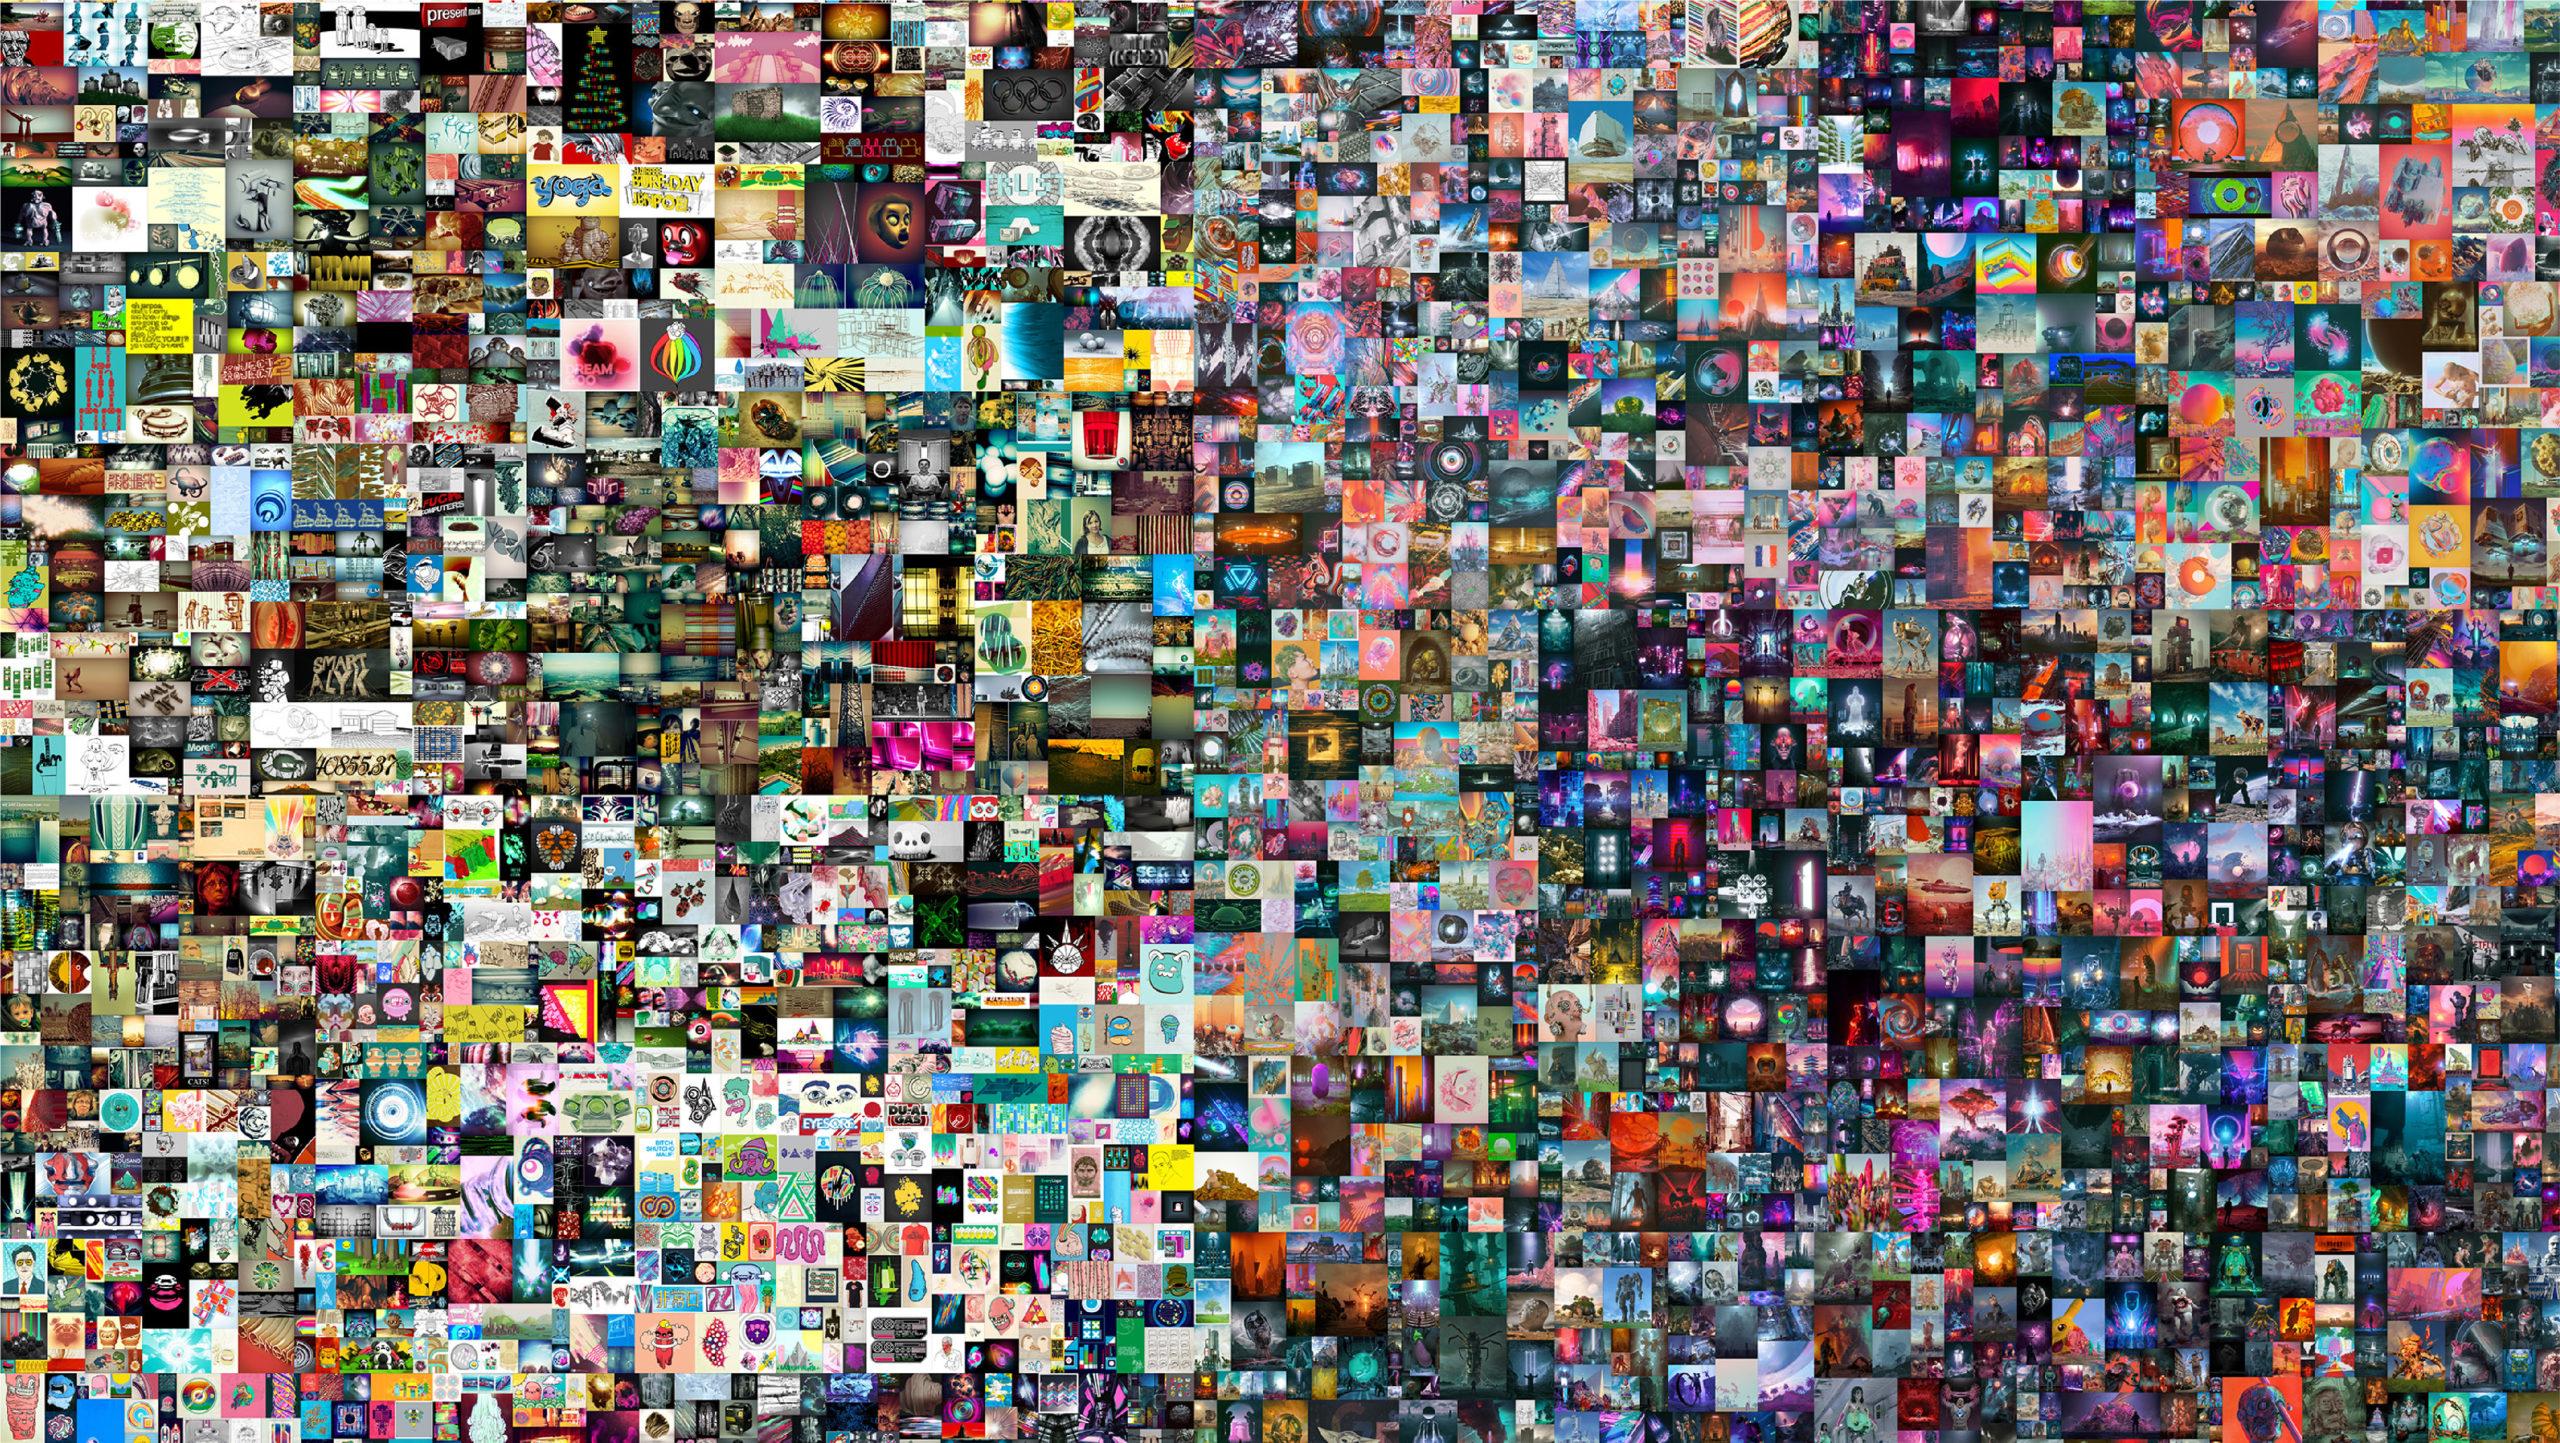 Criptoarte, al alza; Christie's vende obra digital NFT en 70 mdd